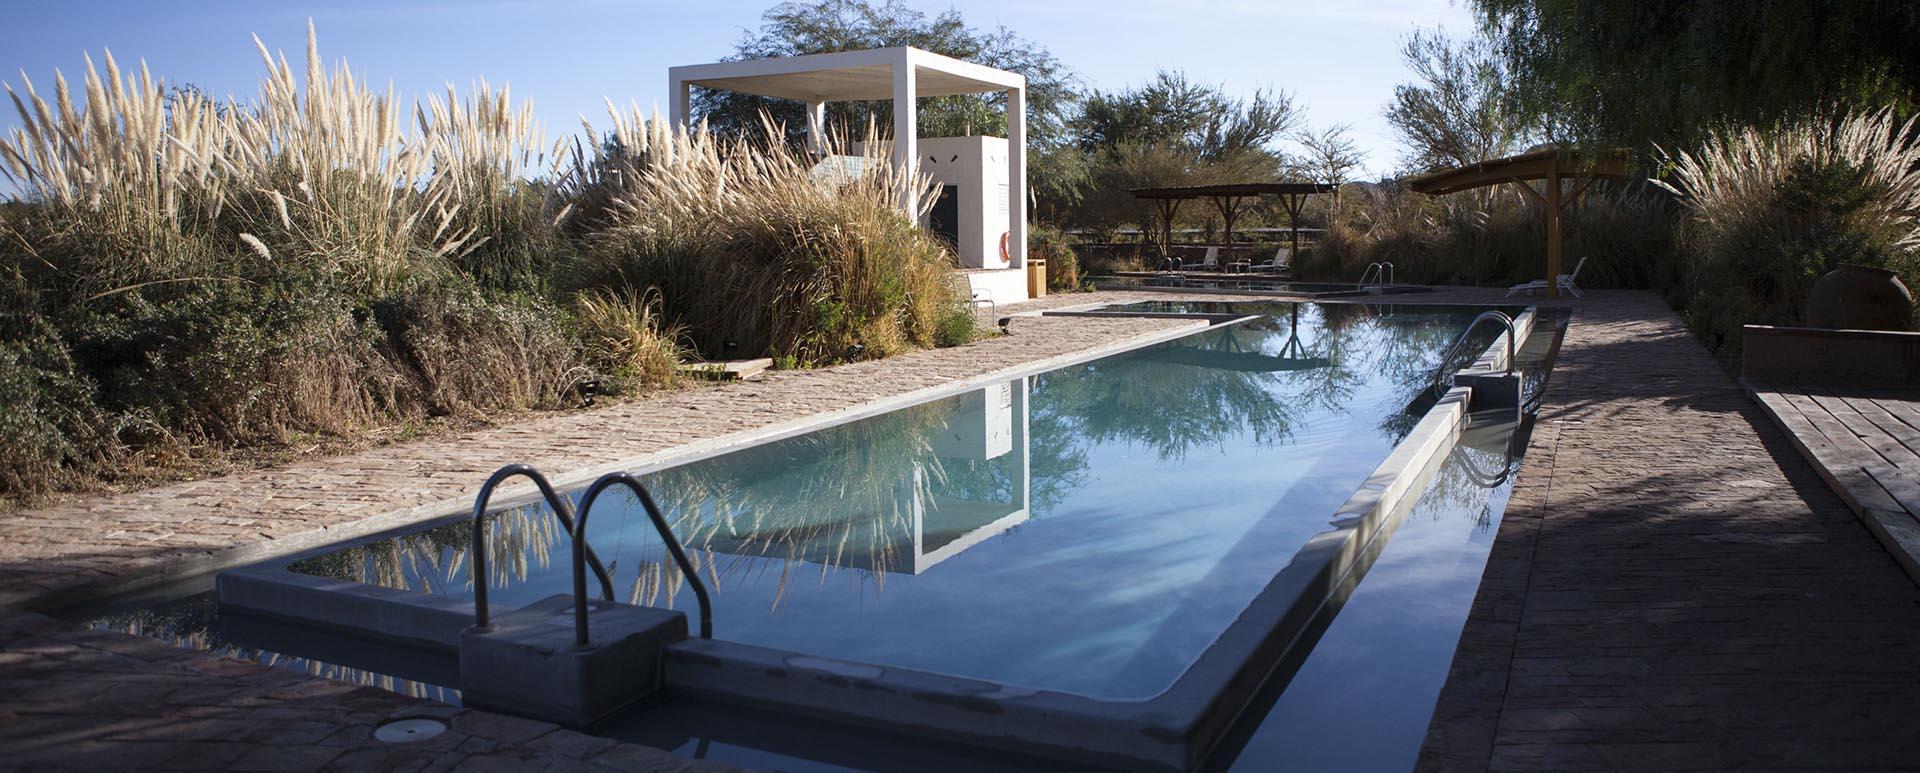 Explora Atacama Swimming Pool